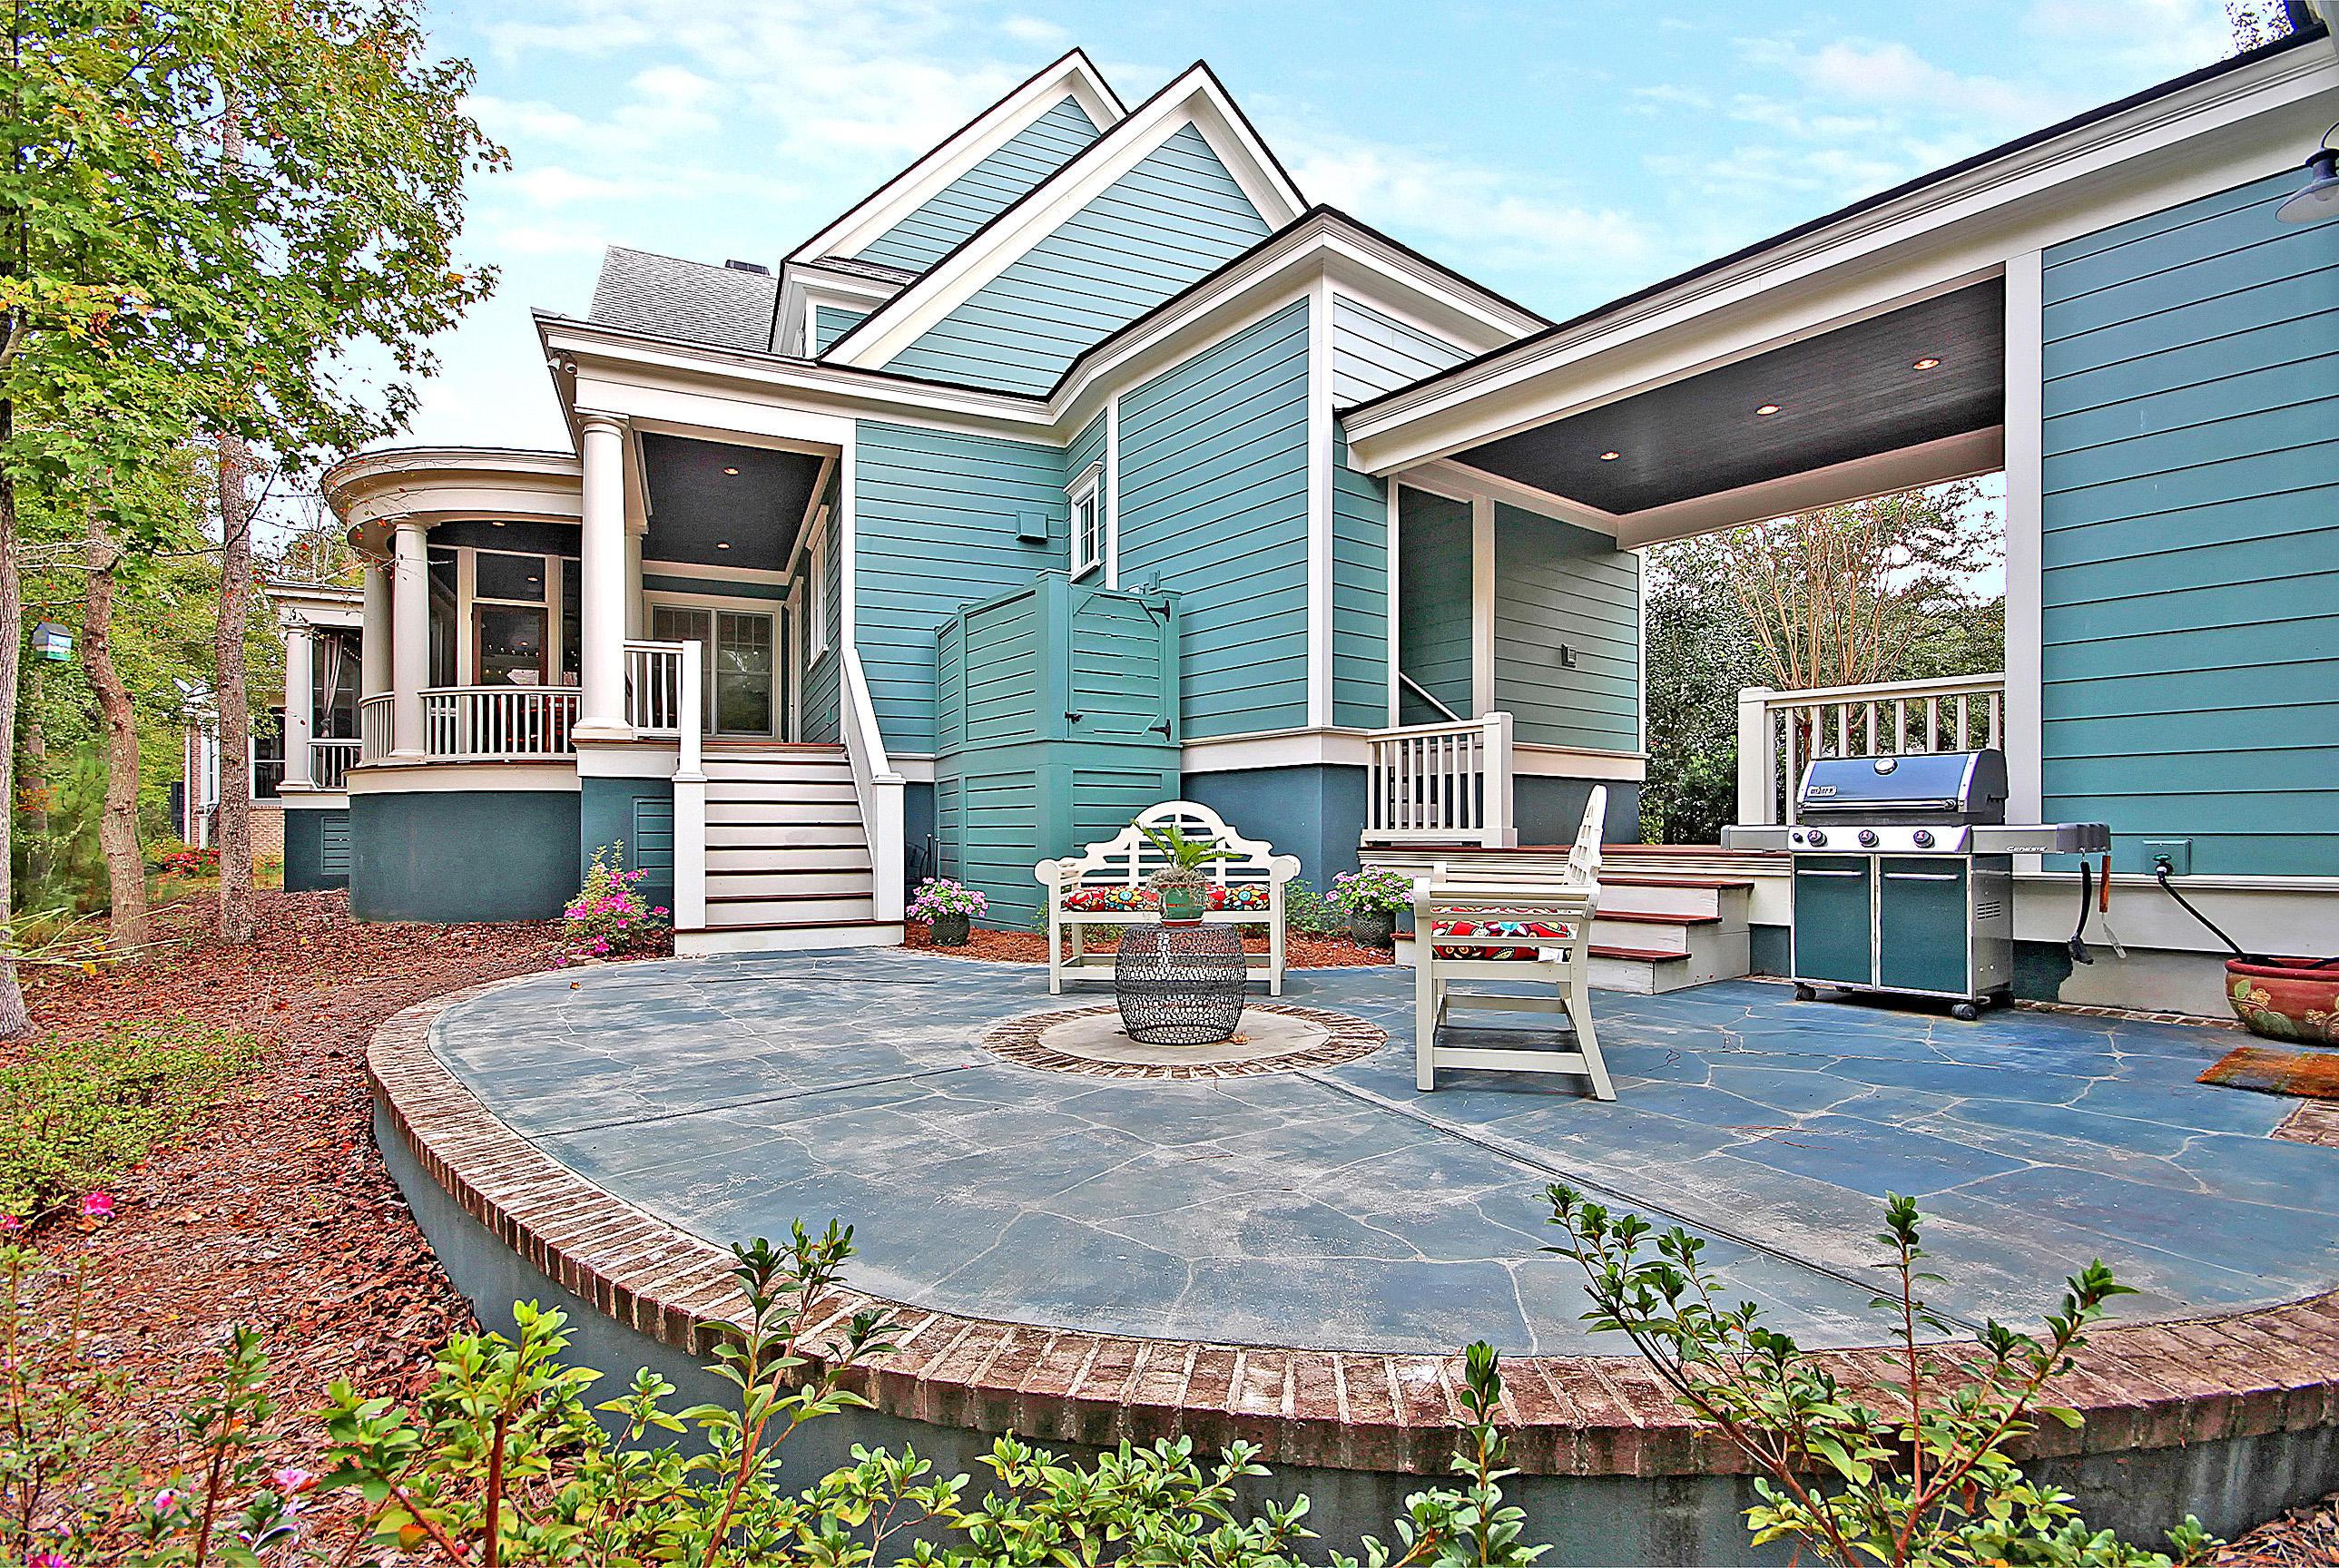 Daniel Island Homes For Sale - 1136 Oak Overhang, Daniel Island, SC - 31